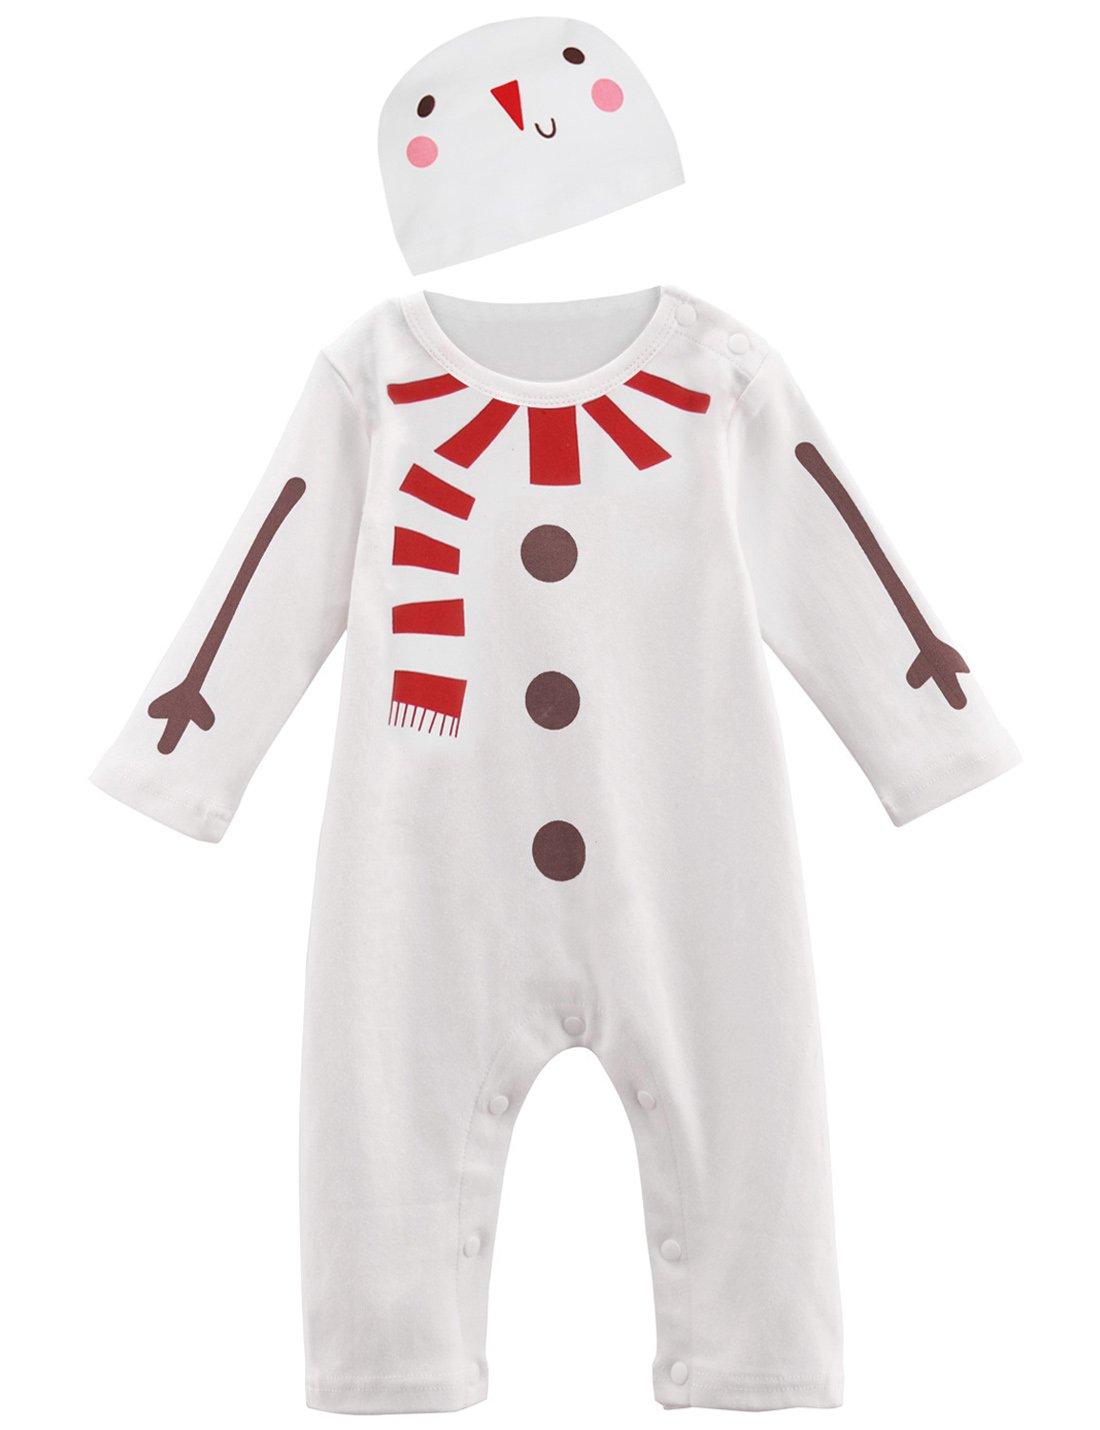 Mombebe Baby Boys' Snowman Costume Romper